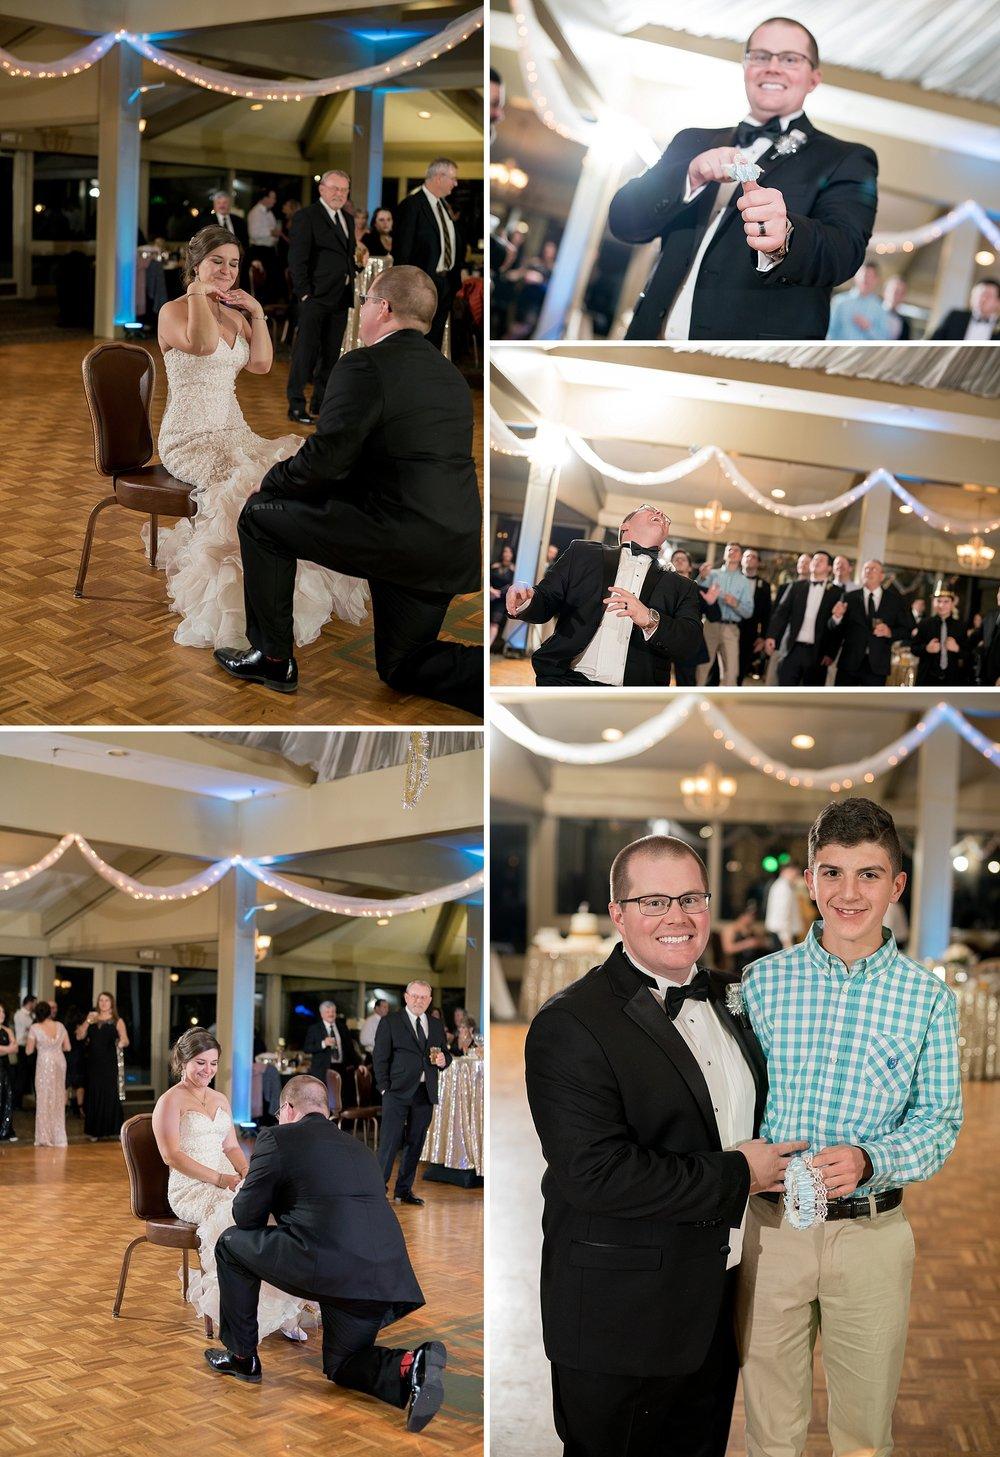 Goldsboro-NC-Photography-Wedding-186.jpg